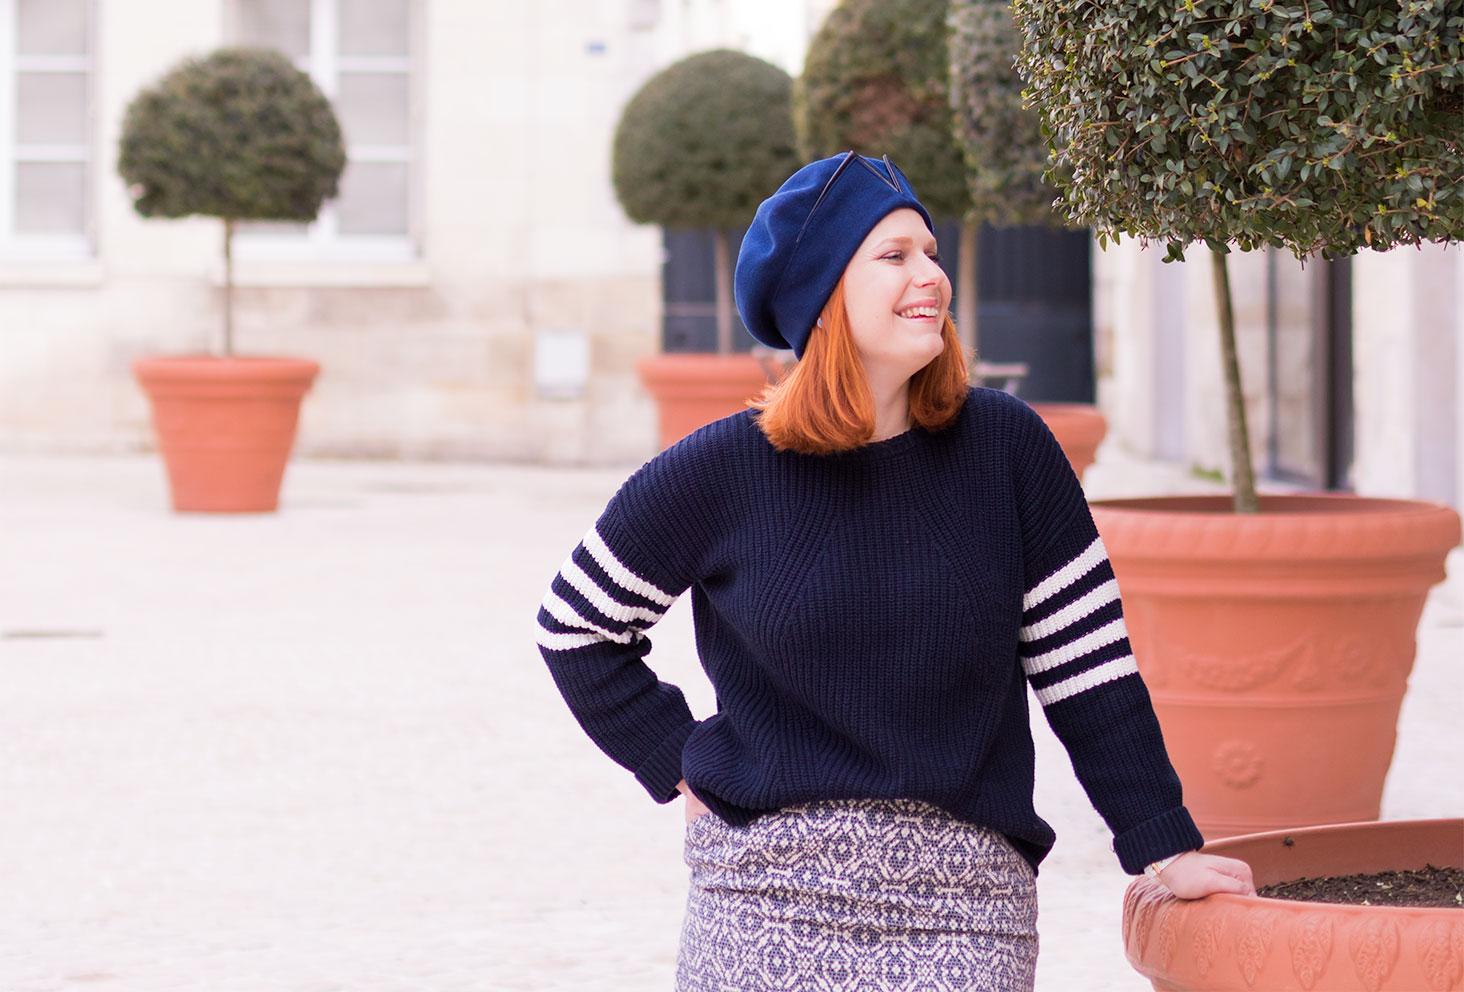 Zoom pull bleu loose et sportswear dans un look en camaïeu de bleu